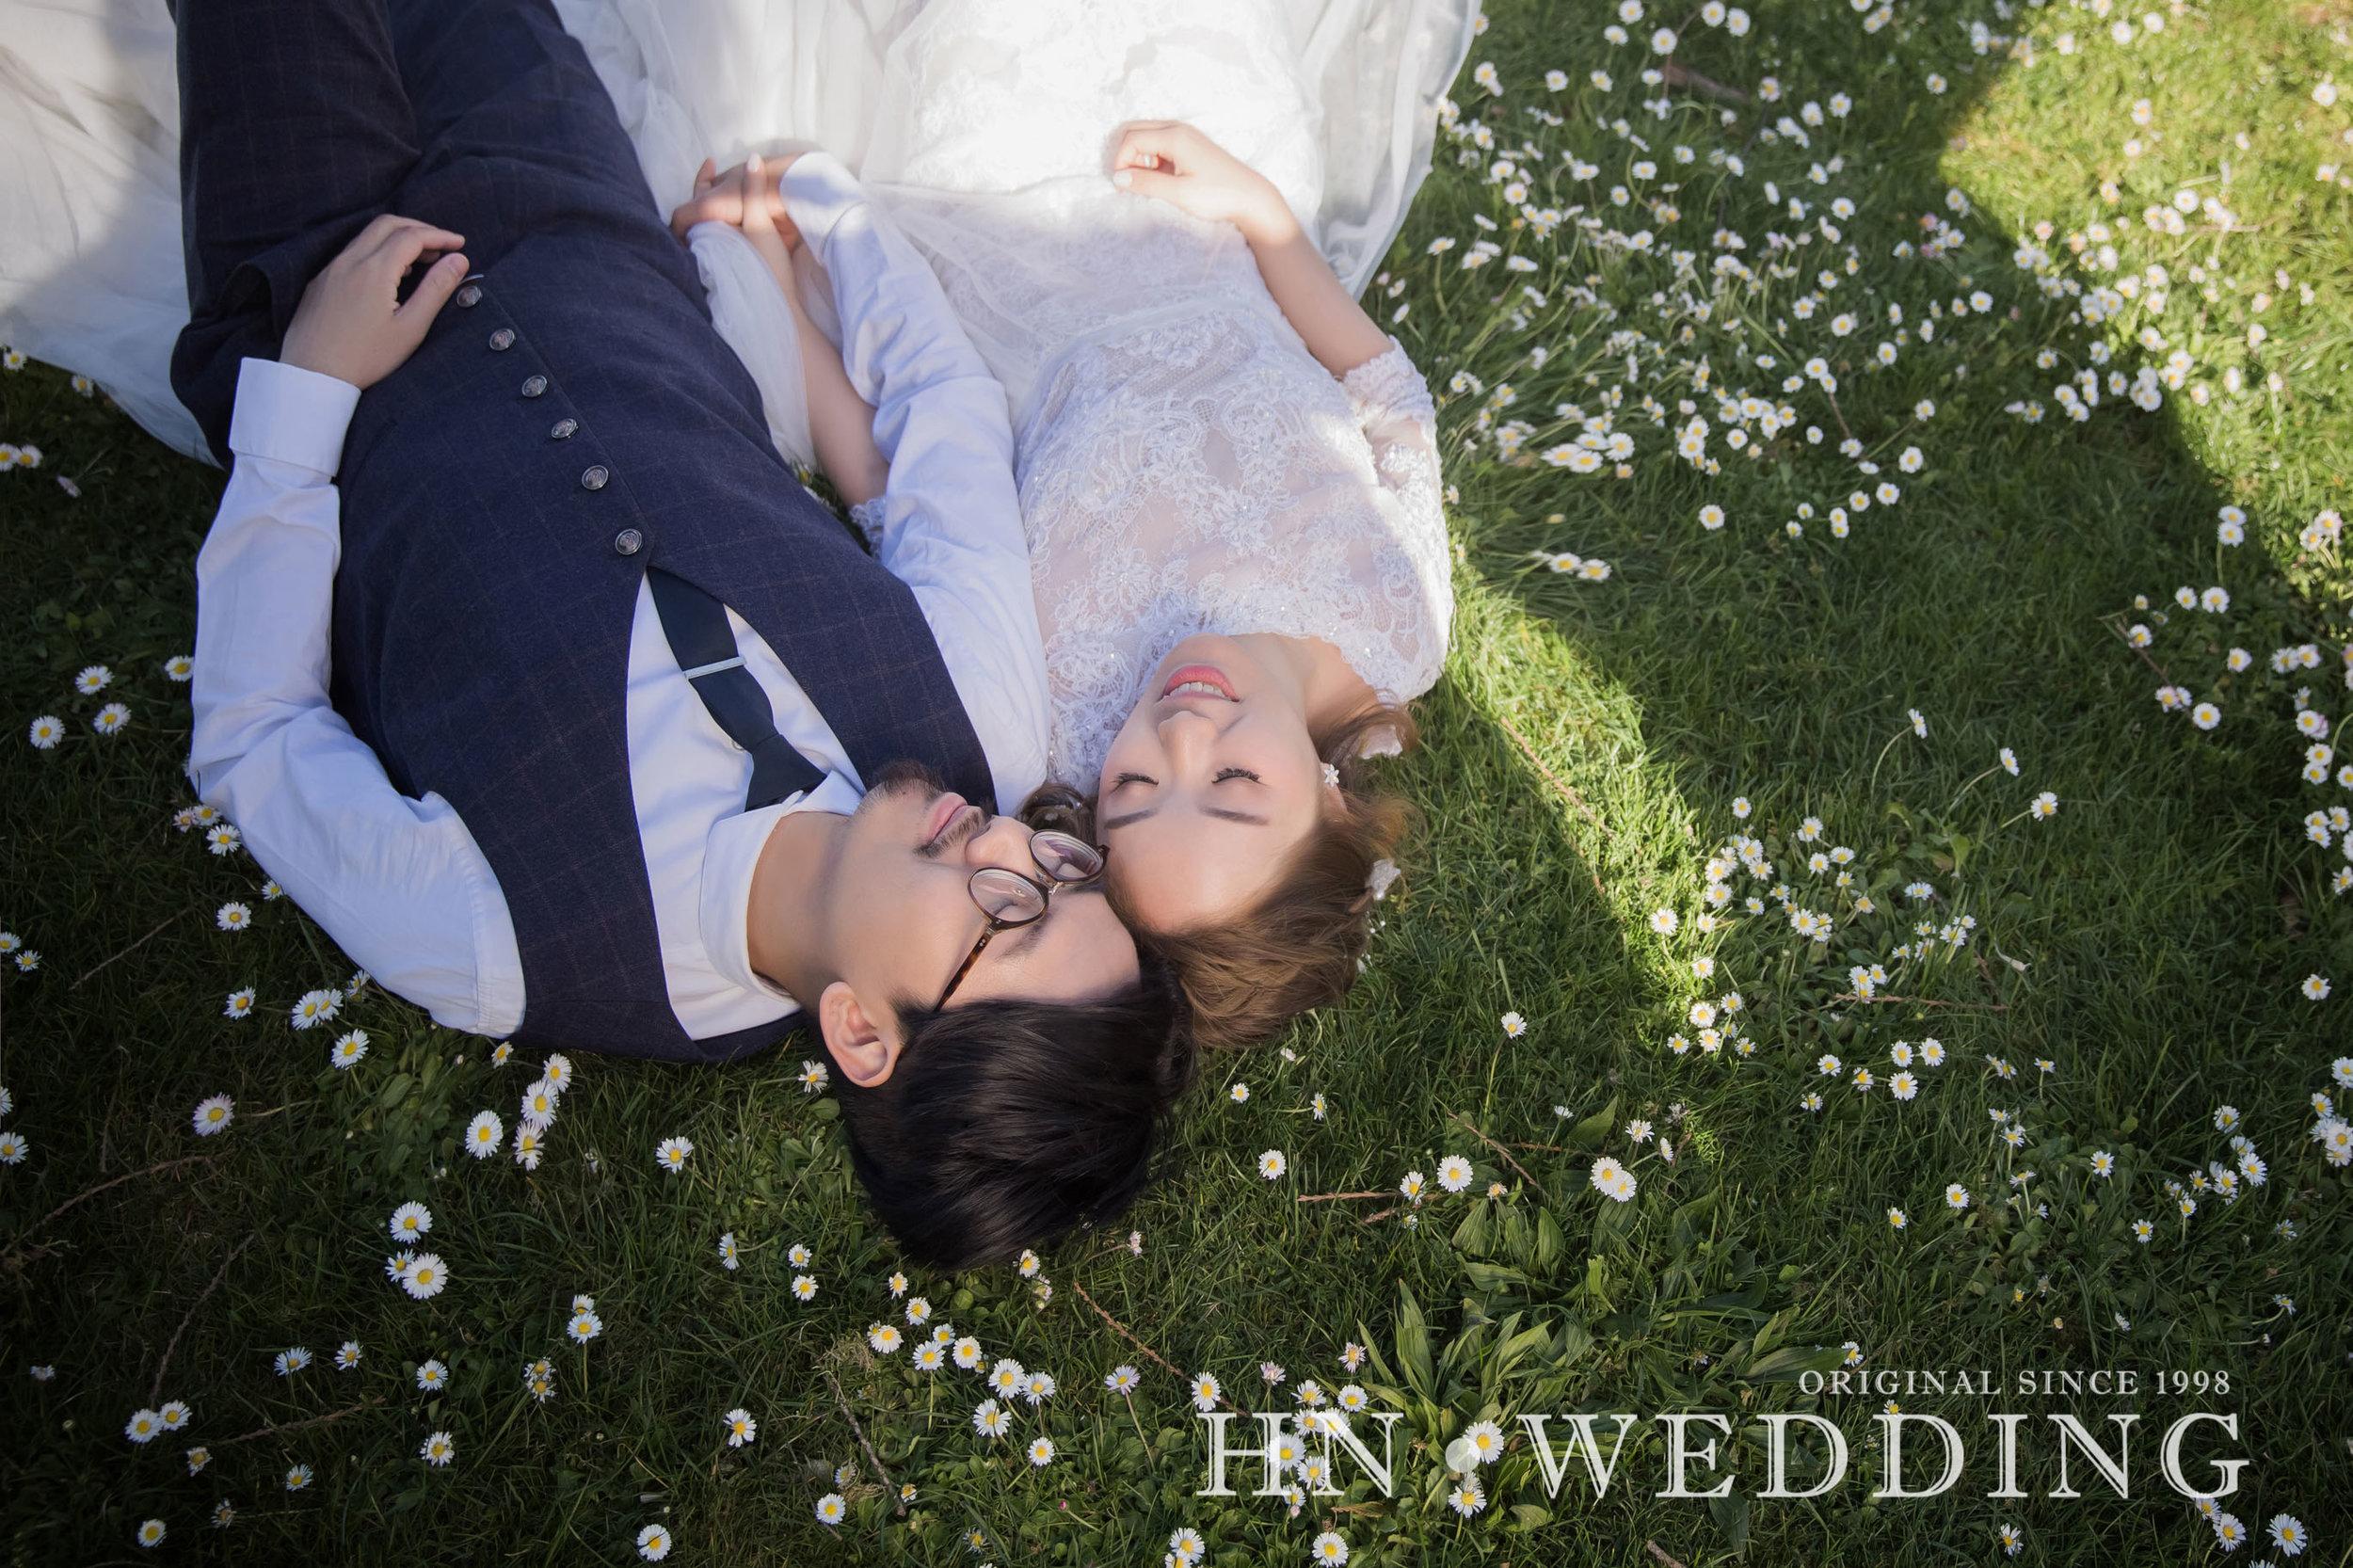 hnweddingweddingdayA&R-25.jpg